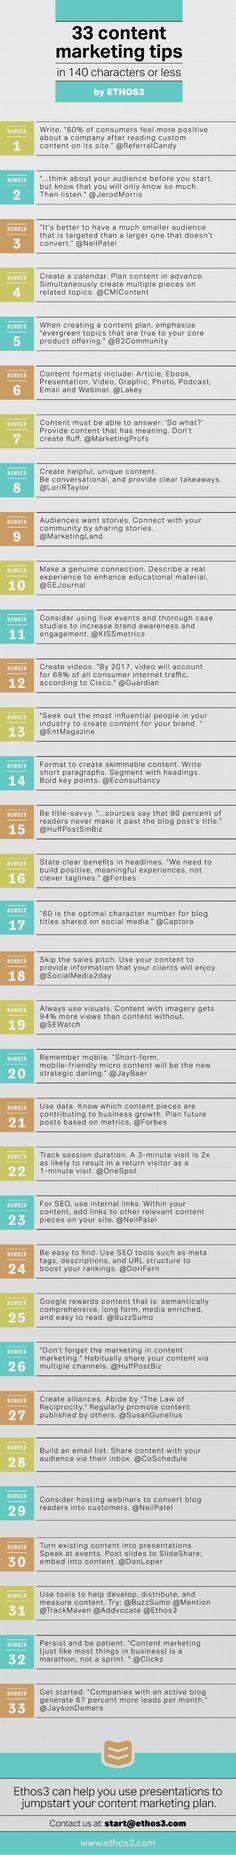 Httpssocialmediastrategytemplateblogspotcom - Blog content strategy template